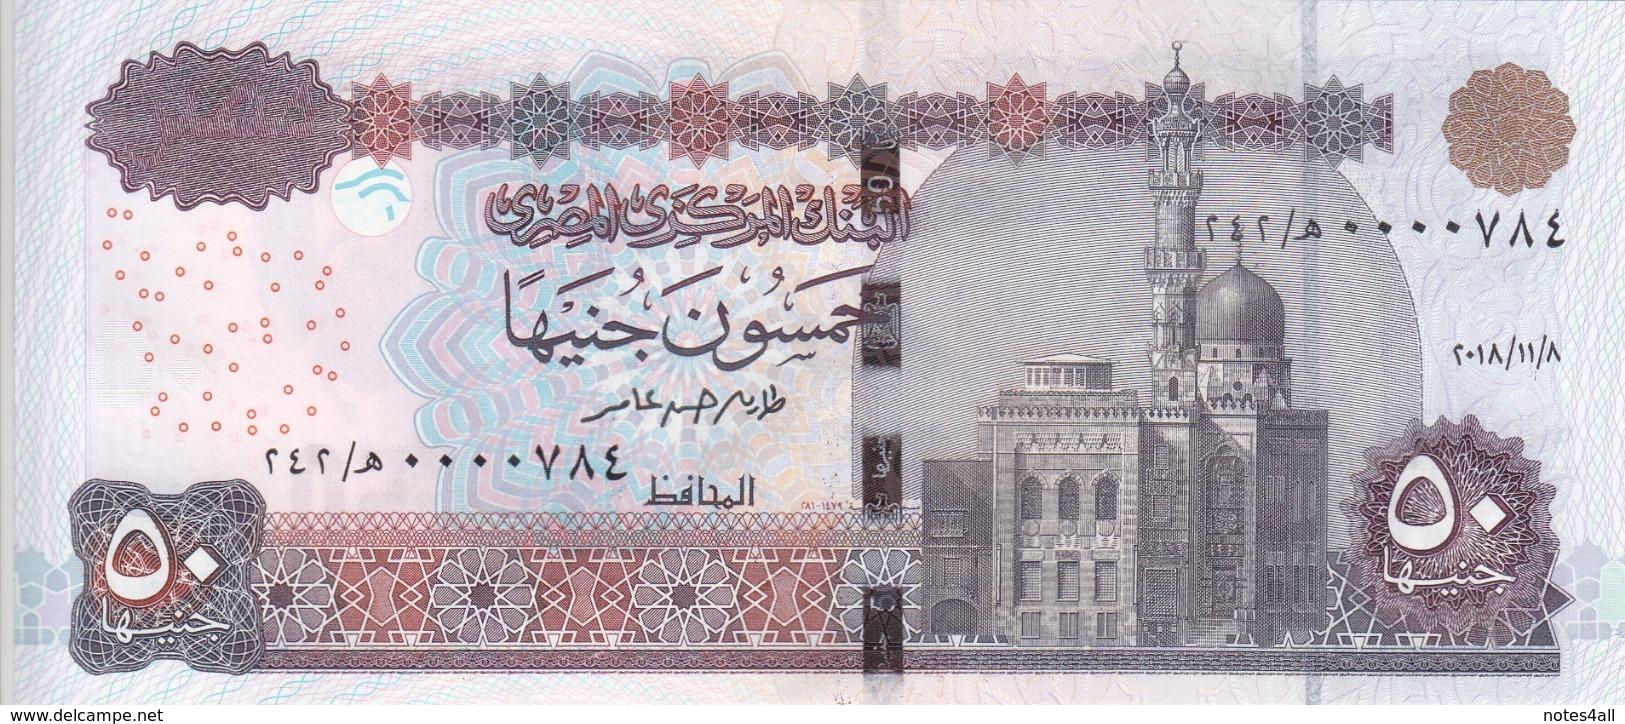 EGYPT 50 POUNDS EGP 2018 P-66 New SIG/T.AMER #24 UNC LOW SERIAL 0000XXX */* - Egypt